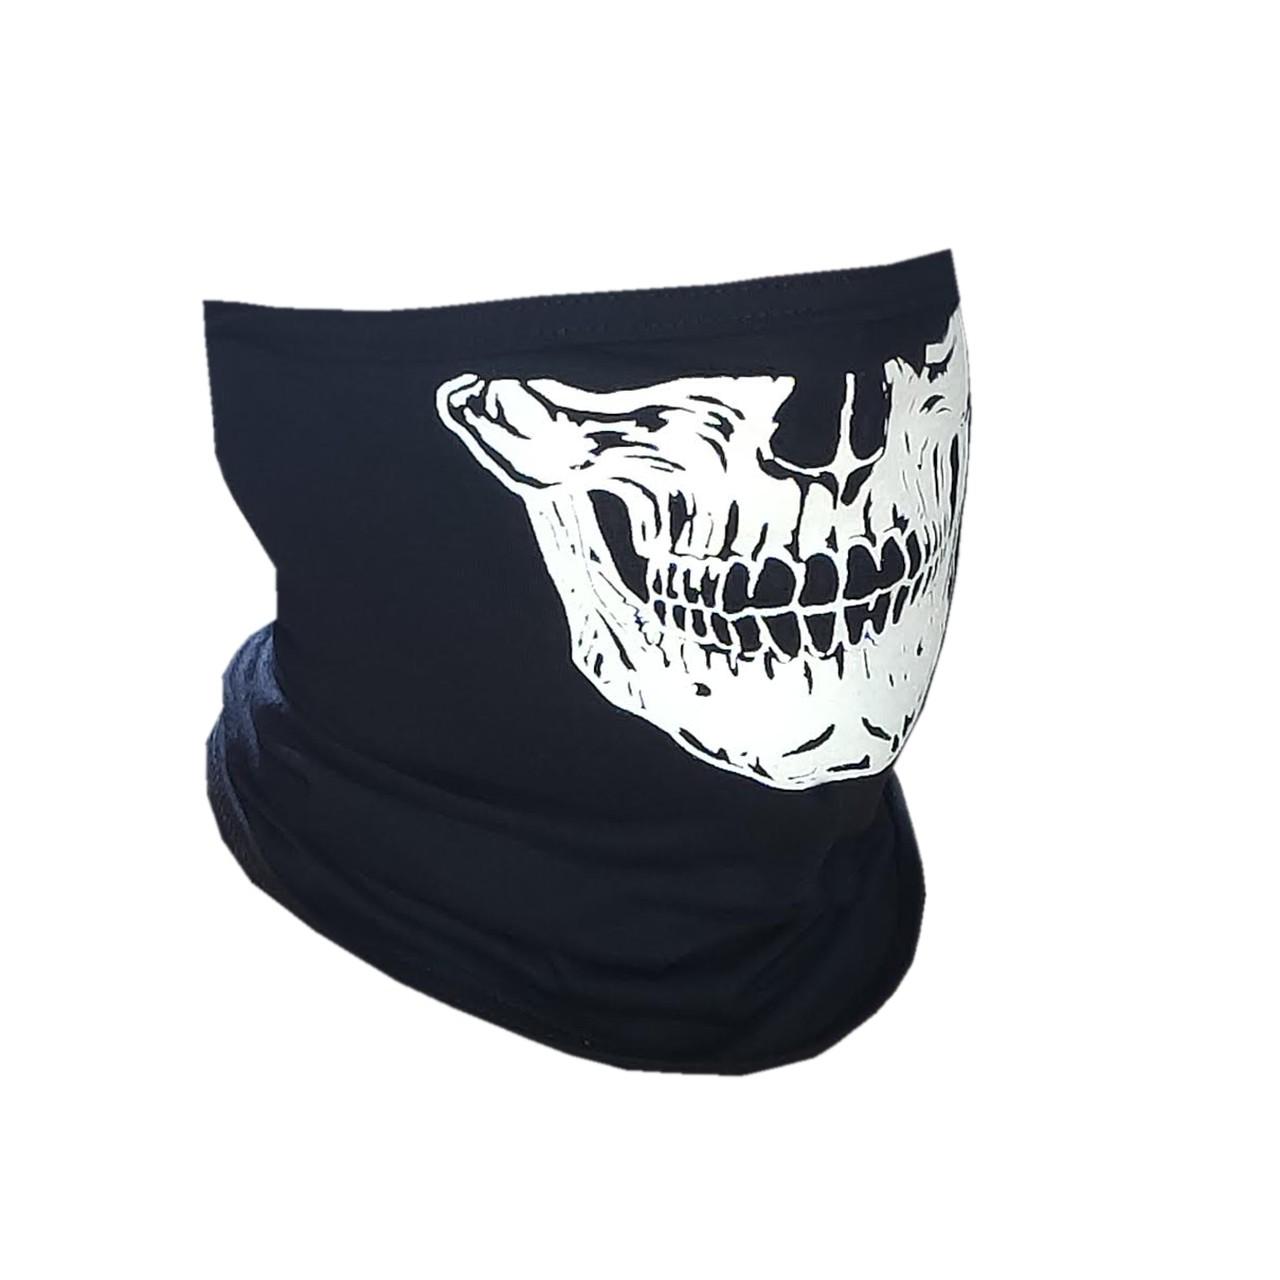 100 X Balaclavas Touca Ninja - Com estampa de Caveiras